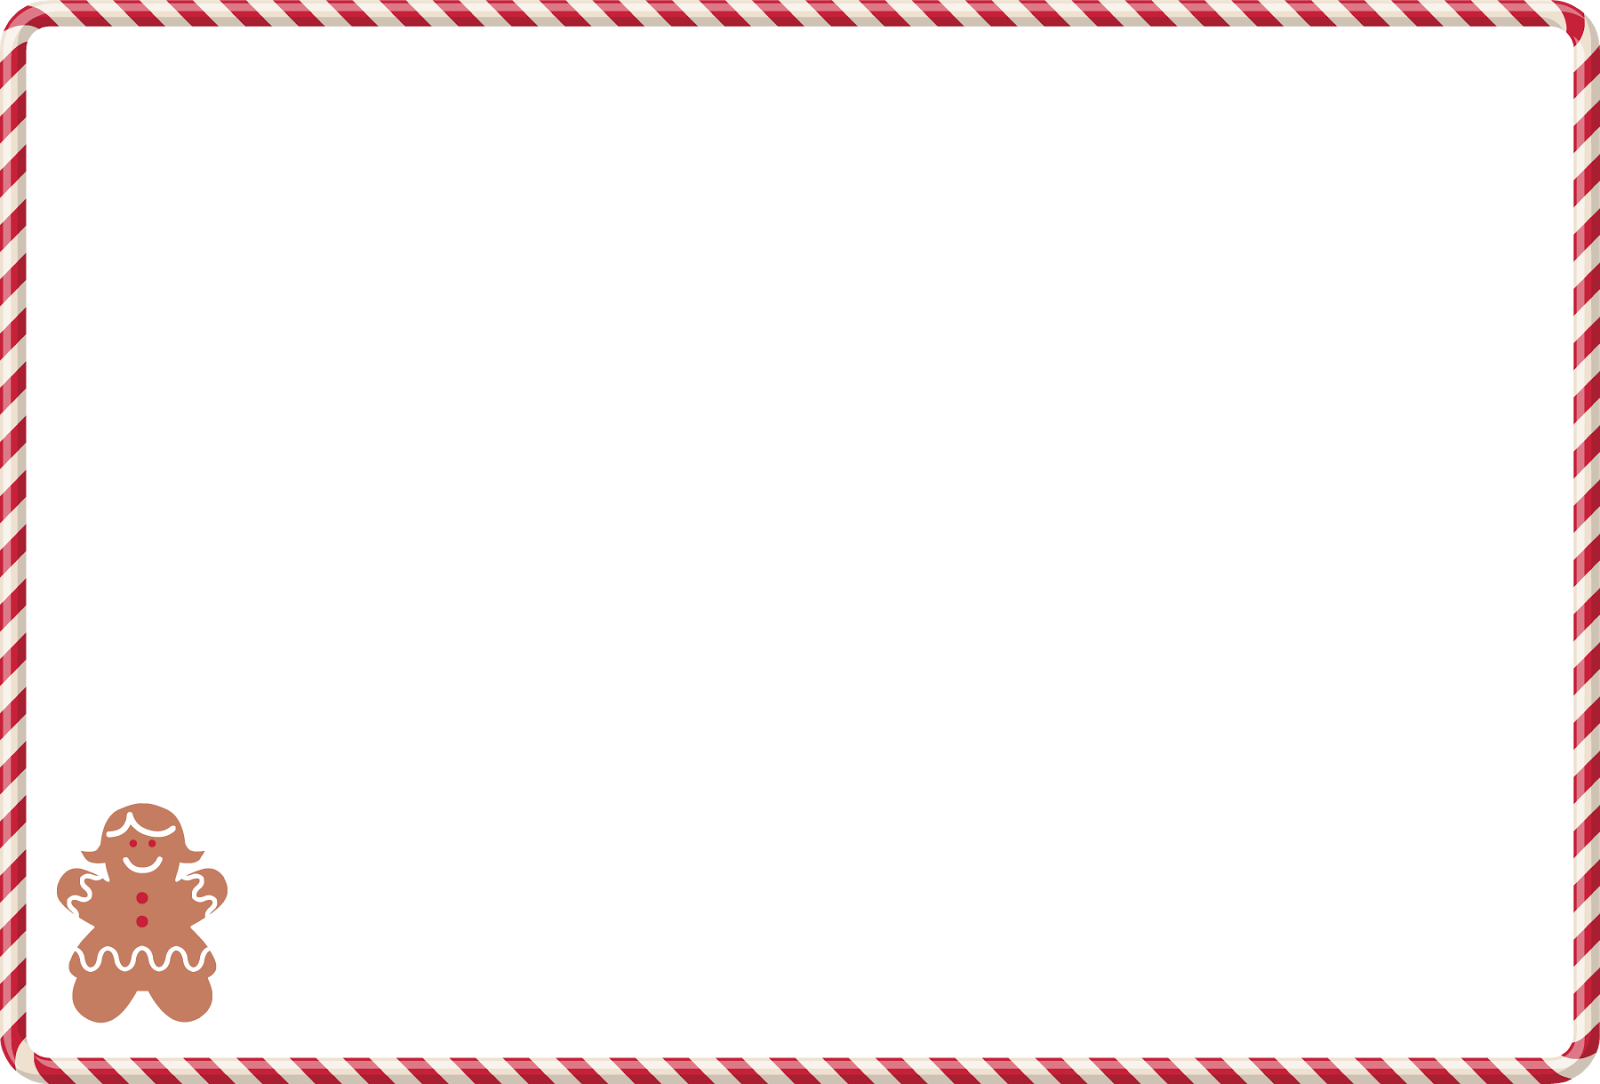 Family Favorite Recipes: Free Christmas Recipe Card Blank